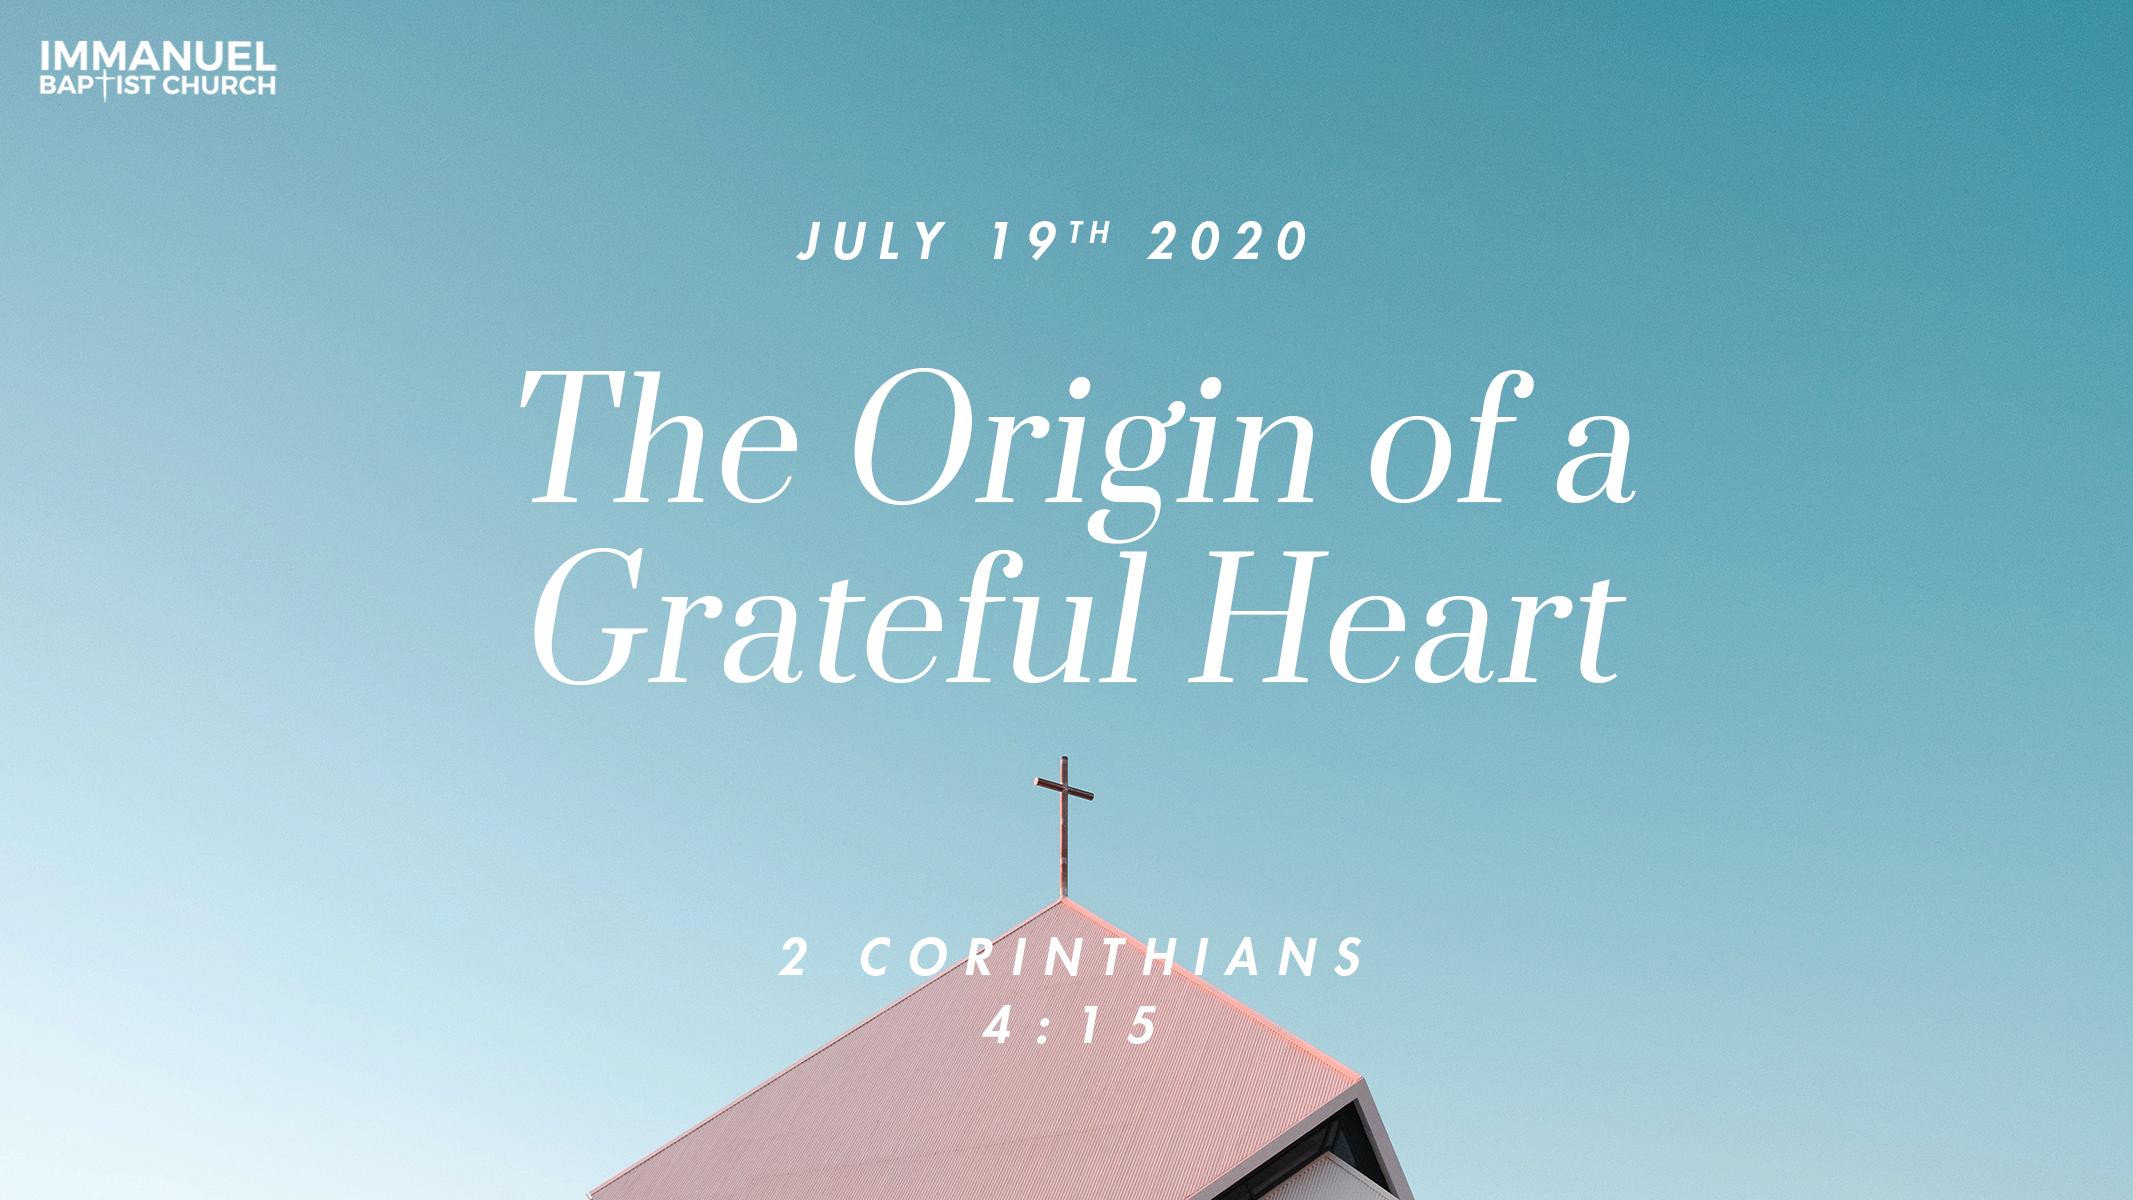 The Origin of a Grateful Heart Image